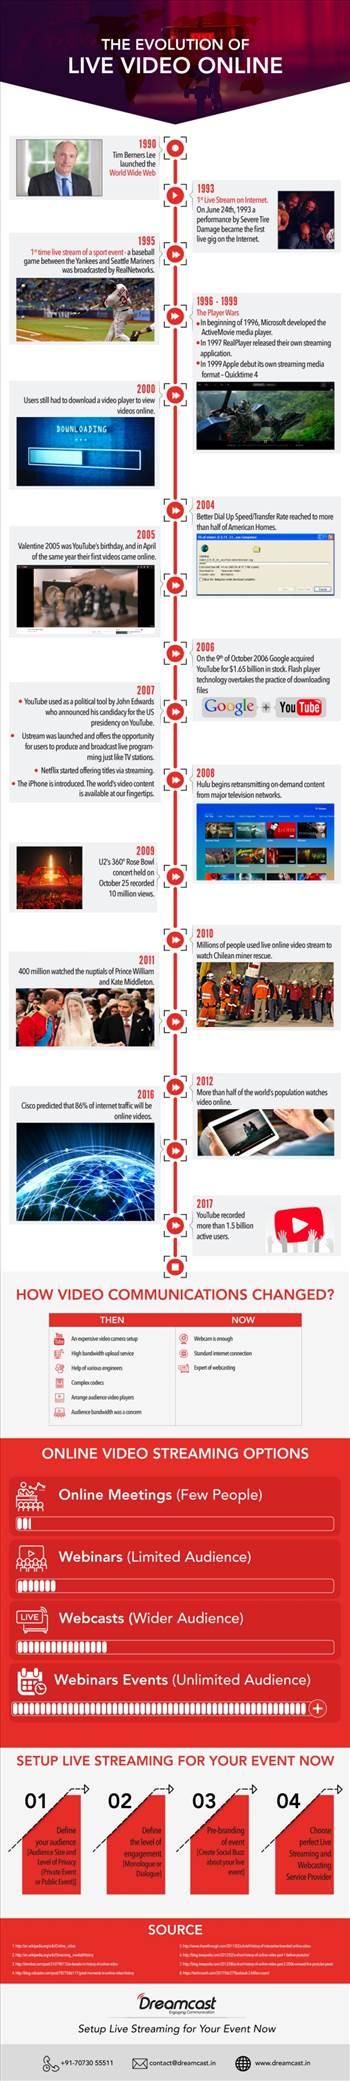 the-evolution-of-live-video-online-1-638.jpg by saanvipatel099